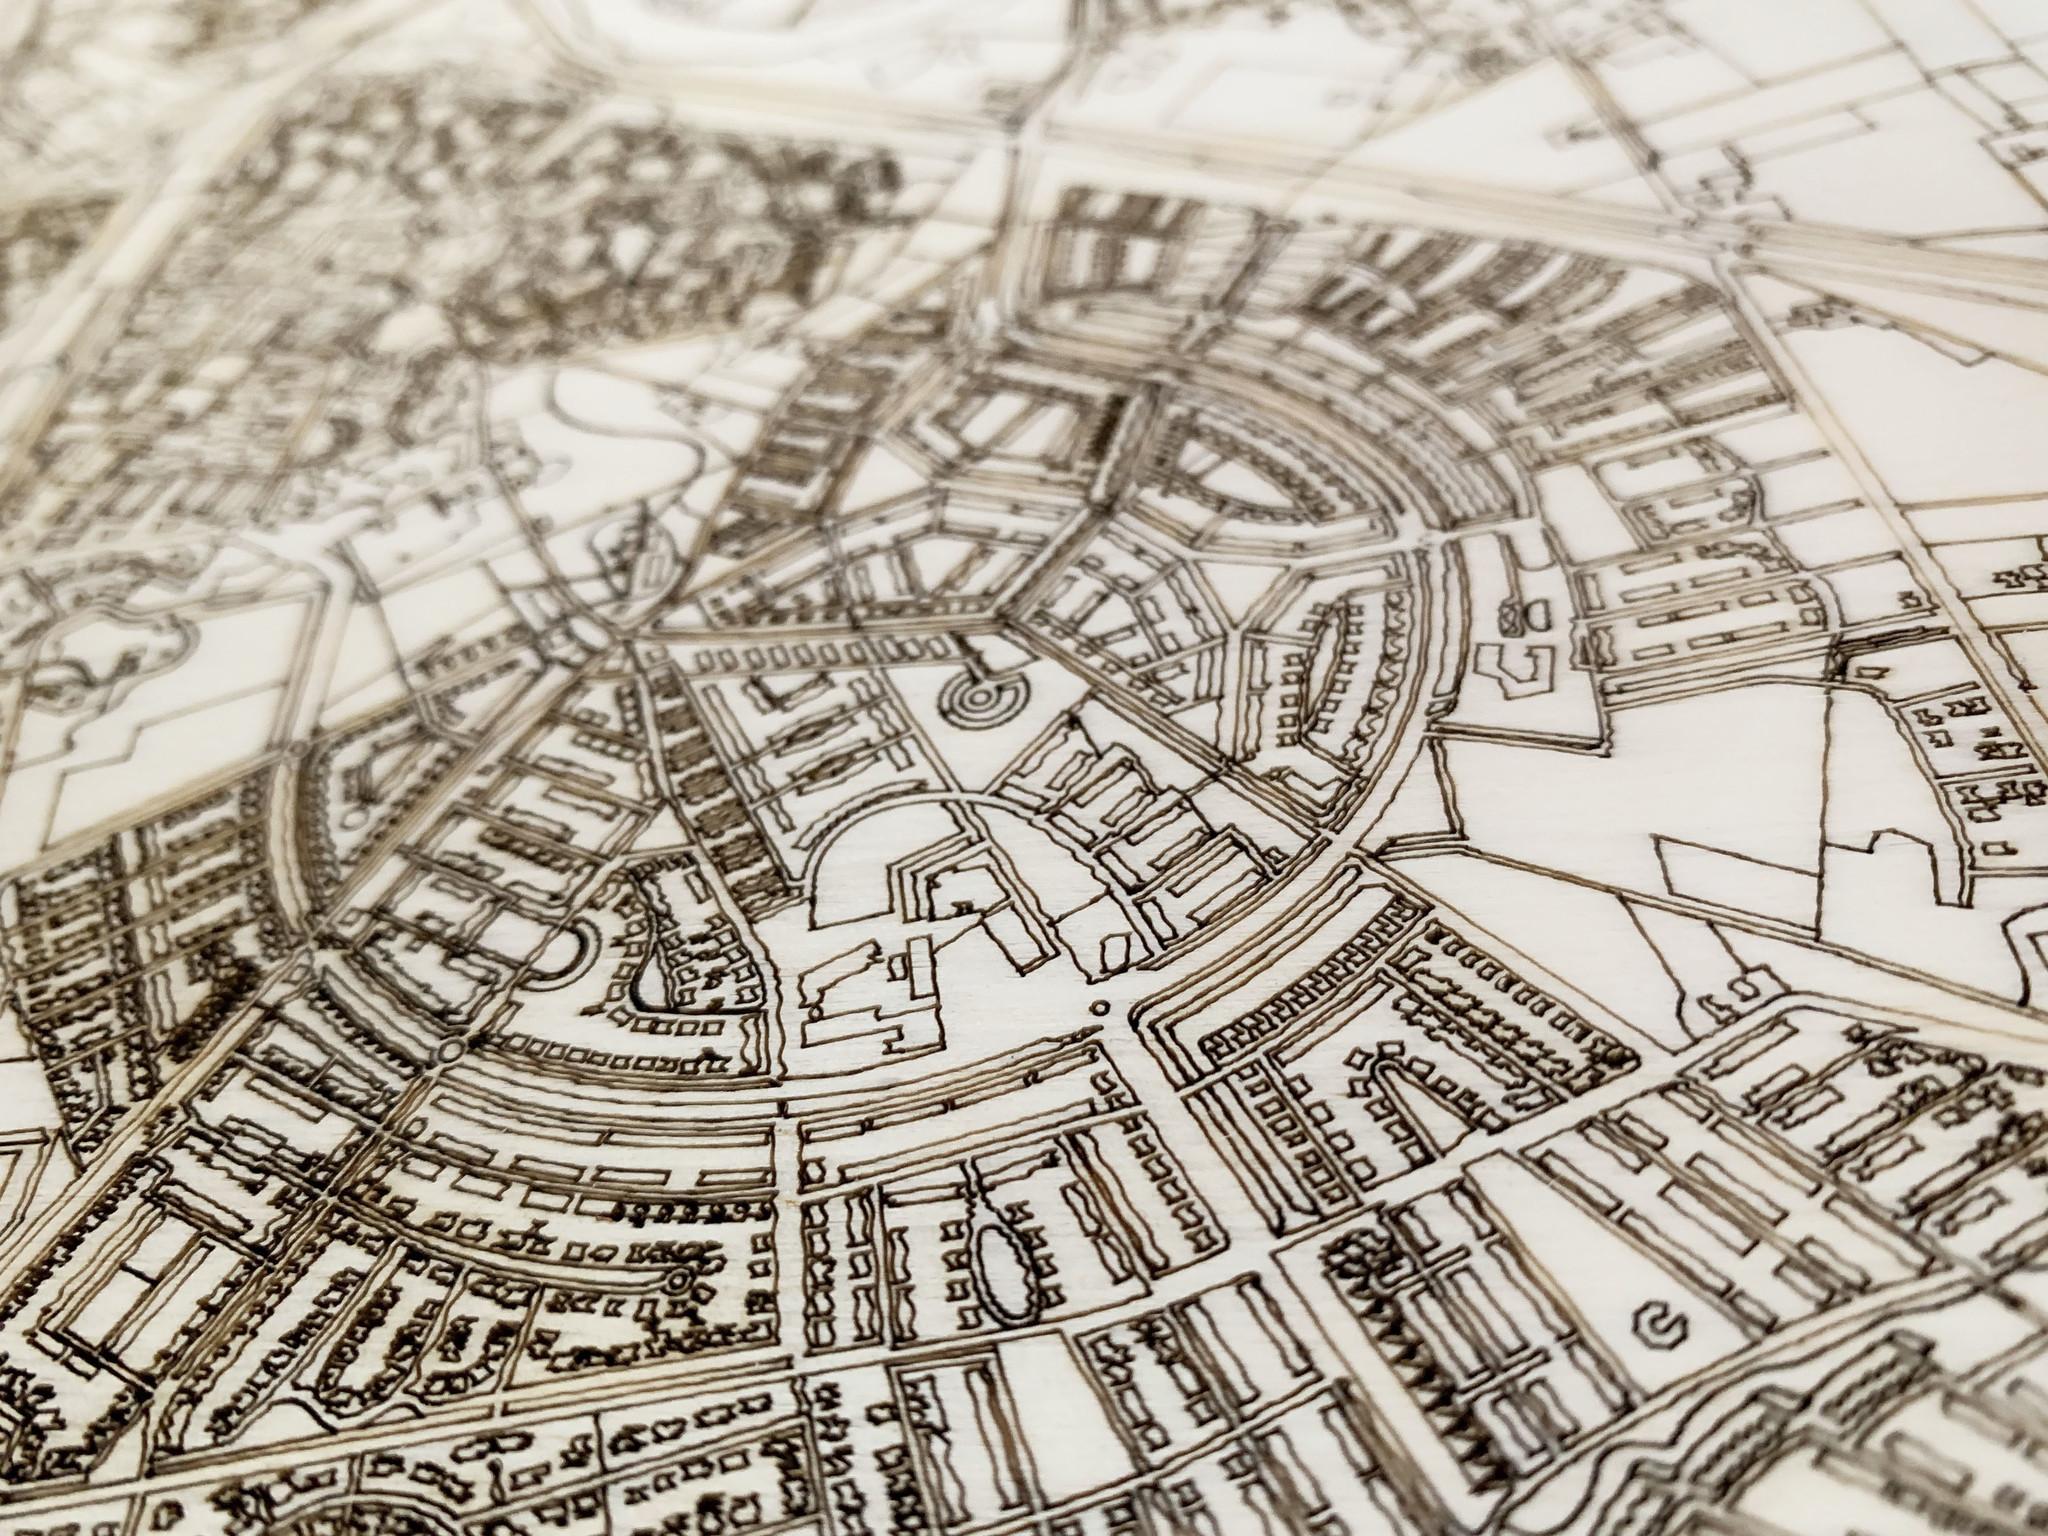 Houten stadsplattegrond Roermond-3